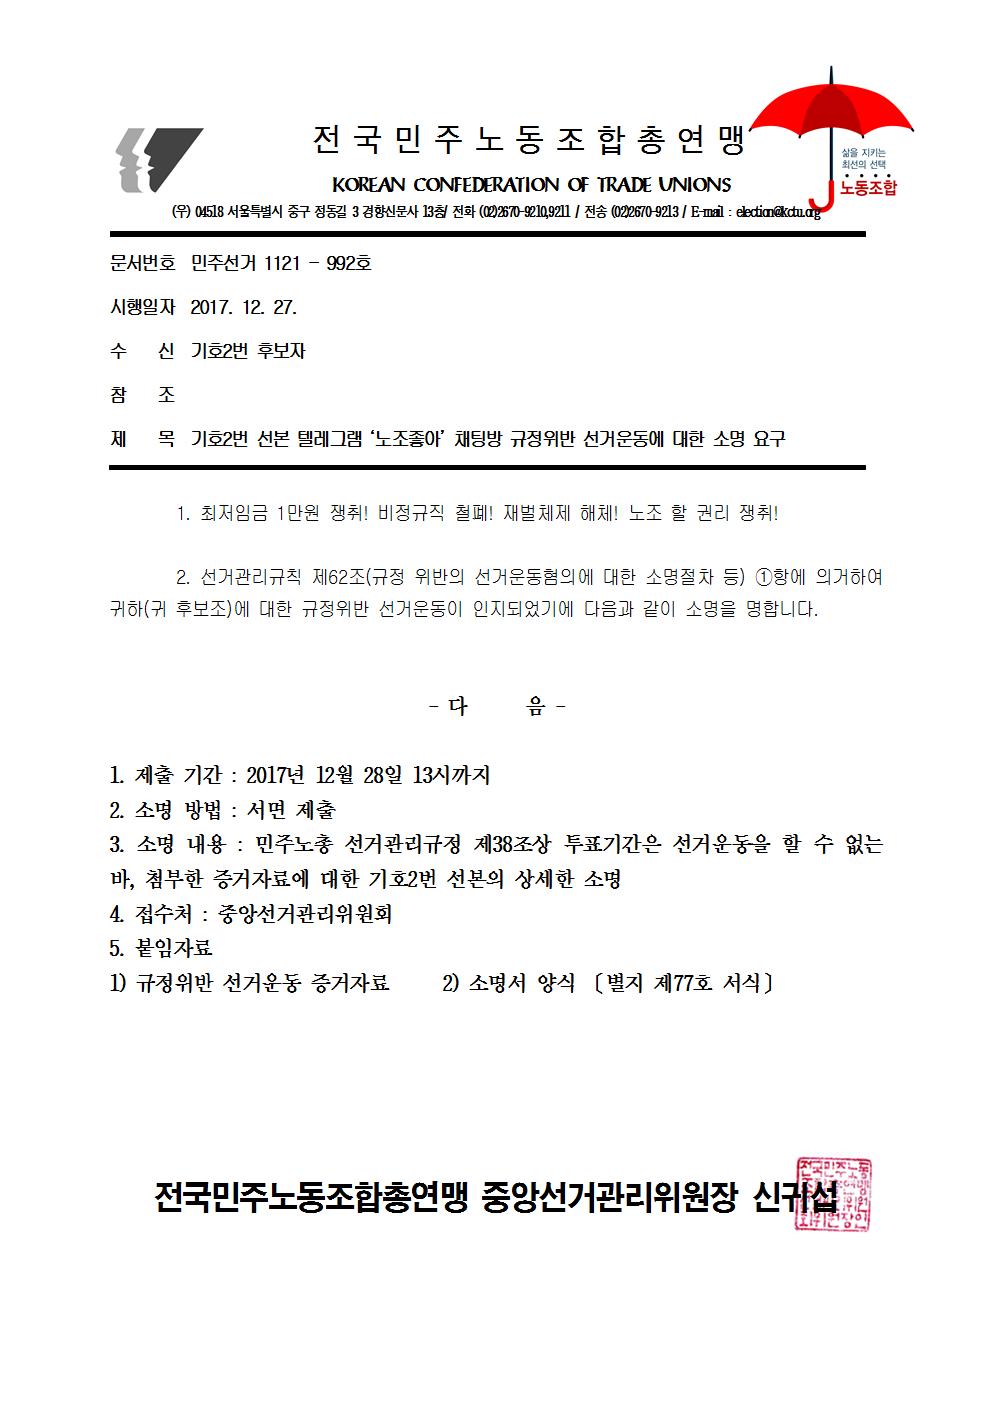 17kctu992_기호2번 선본 텔레그램 '노조좋아' 채팅방 규정위반 선거운동 신고에 대한 소명 요구001.png